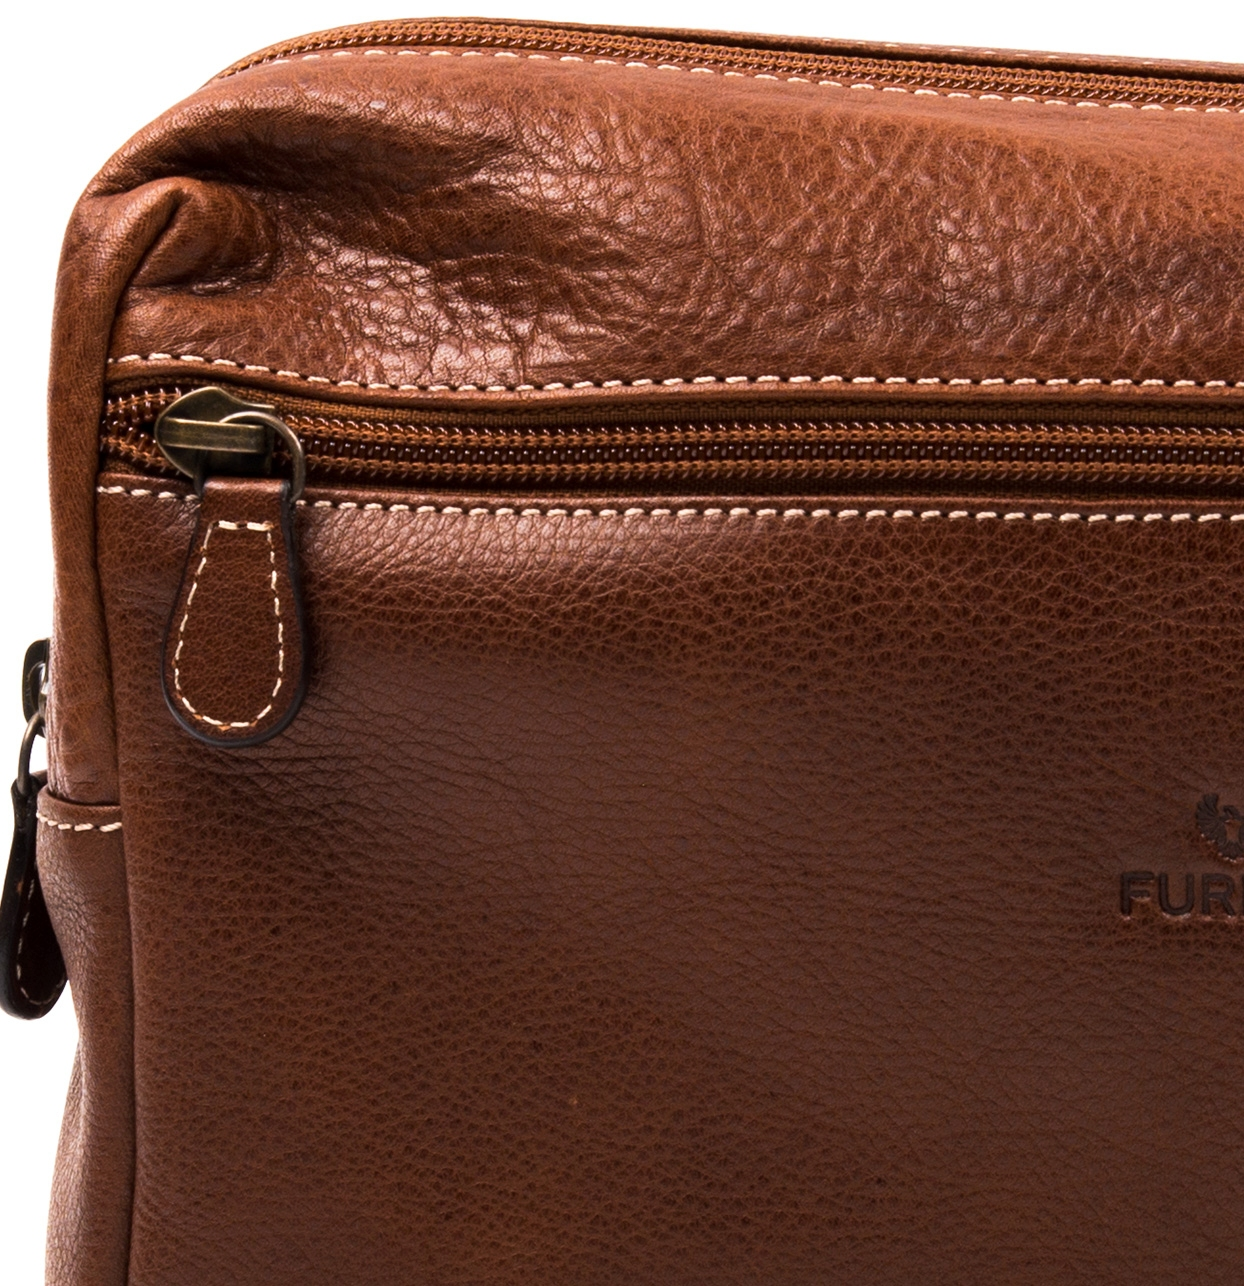 Neceser de piel color marrón natural, modelo TRAVIATA - Ítem2